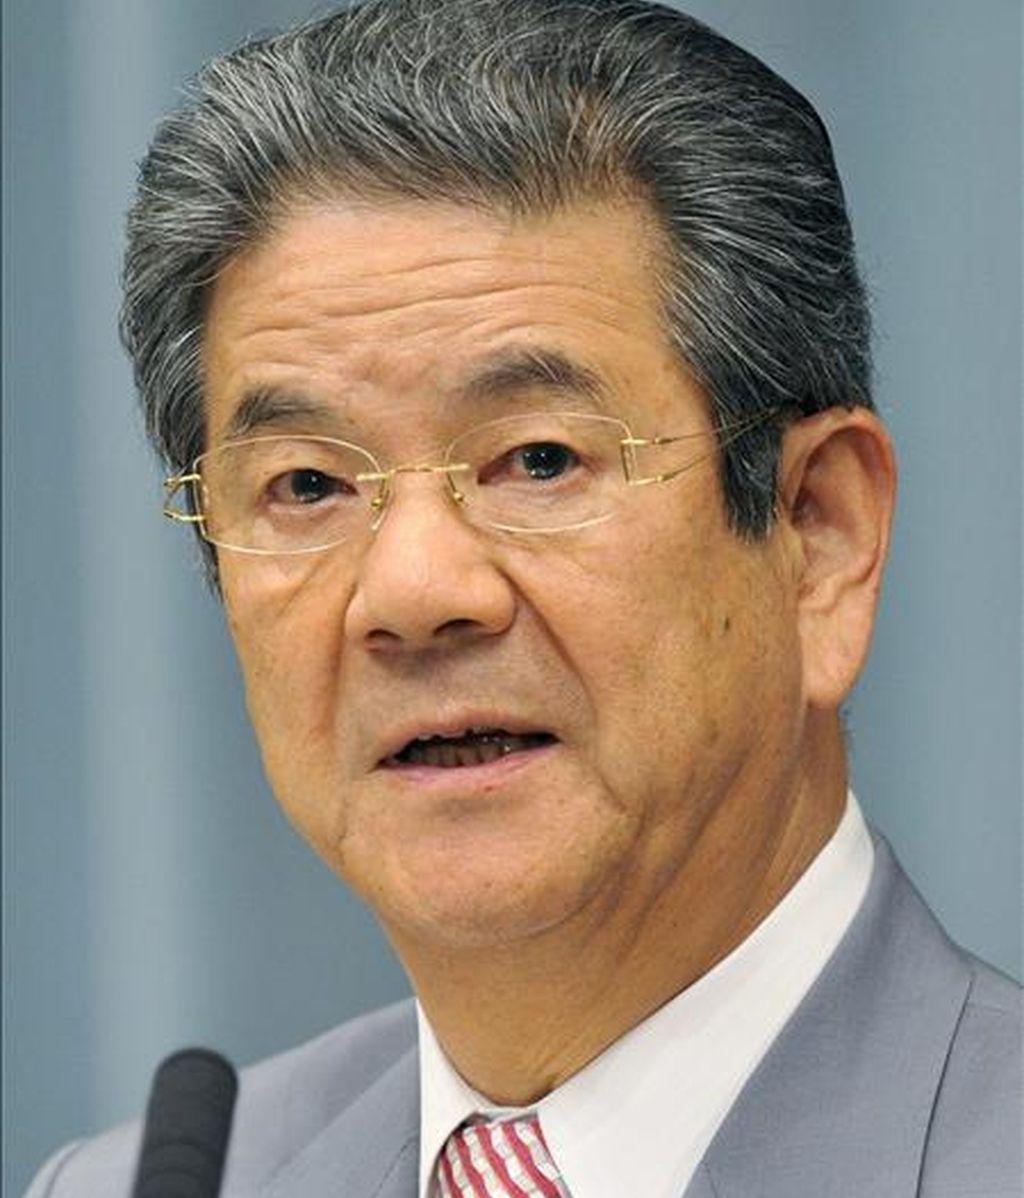 El ministro japonés de Defensa, Toshimi Kitazawa. EFE/Archivo